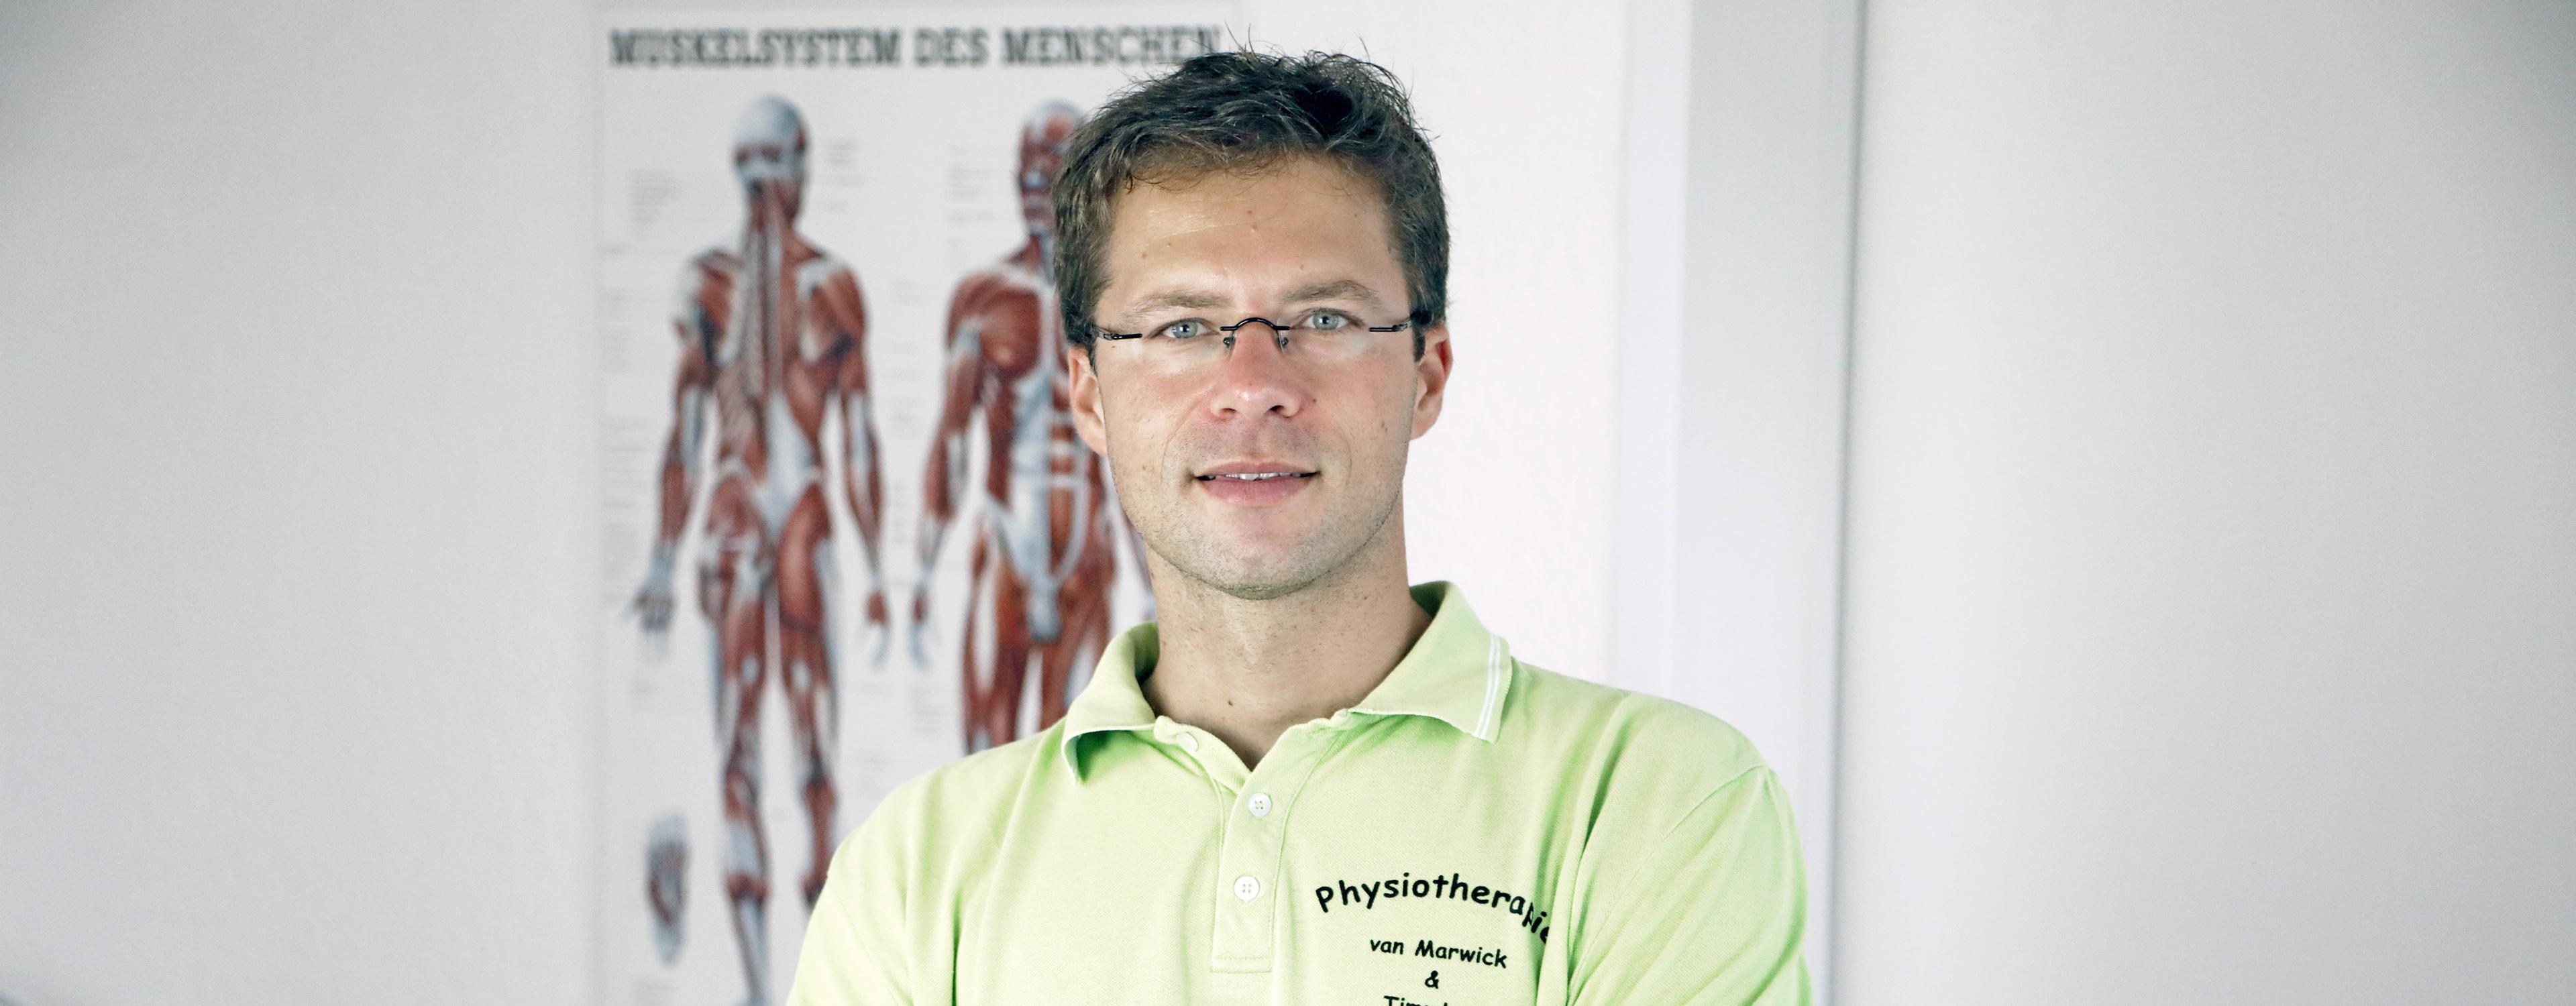 Georg Timmler